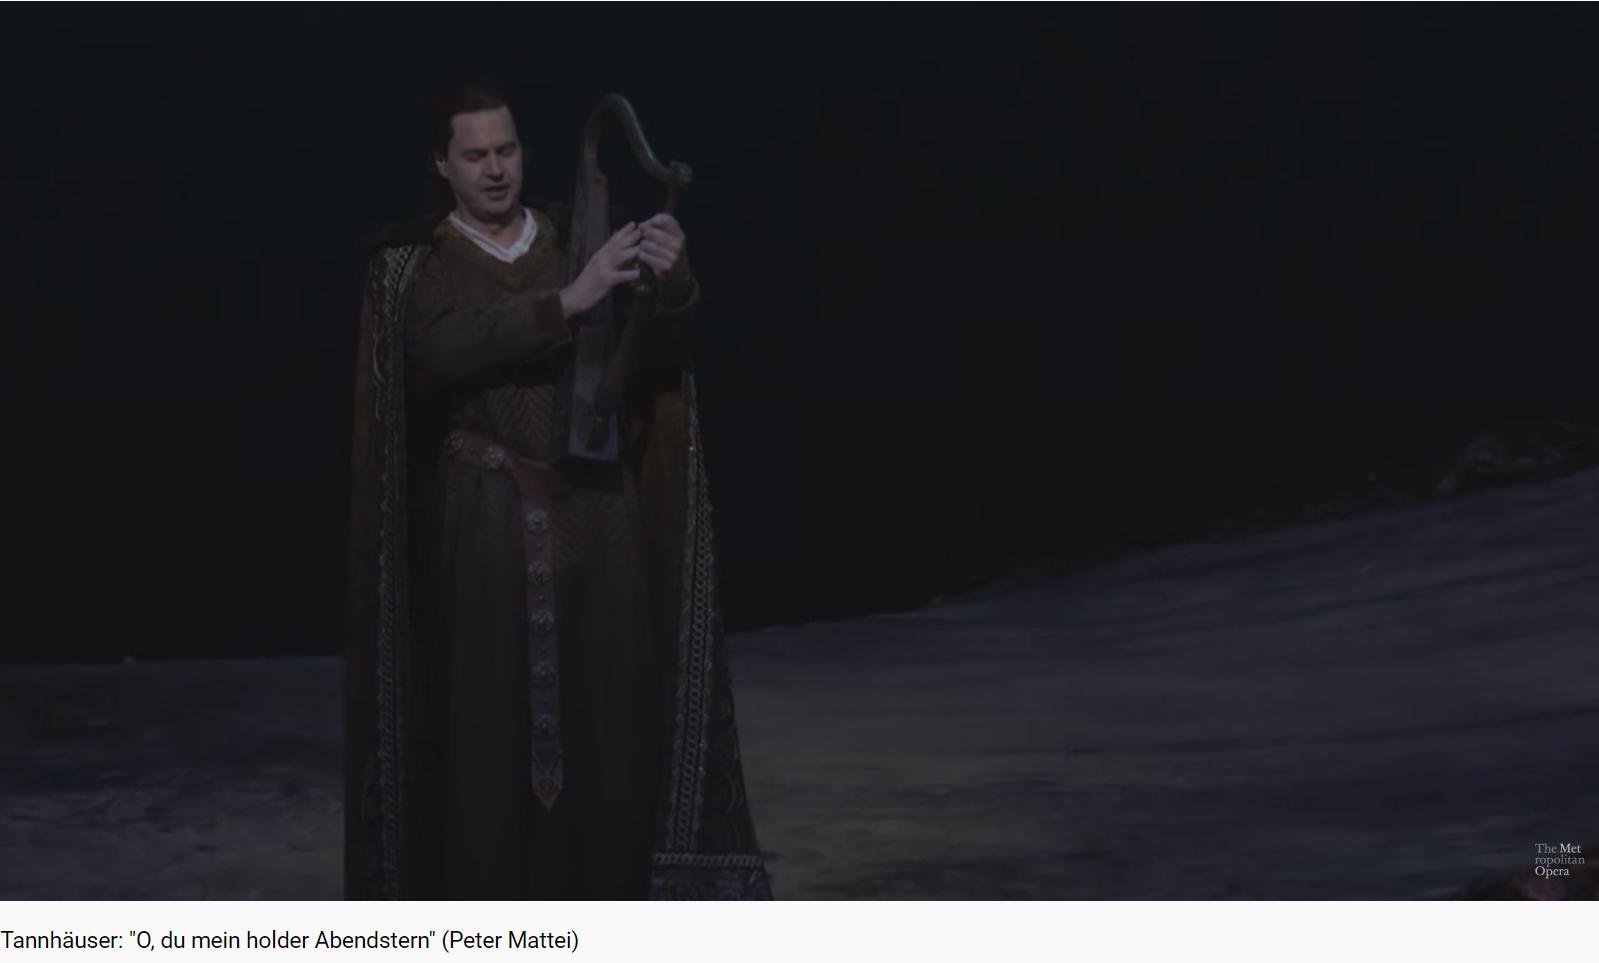 Wagner Tannhauser O, du mein holder Abendstern (MET 2015)